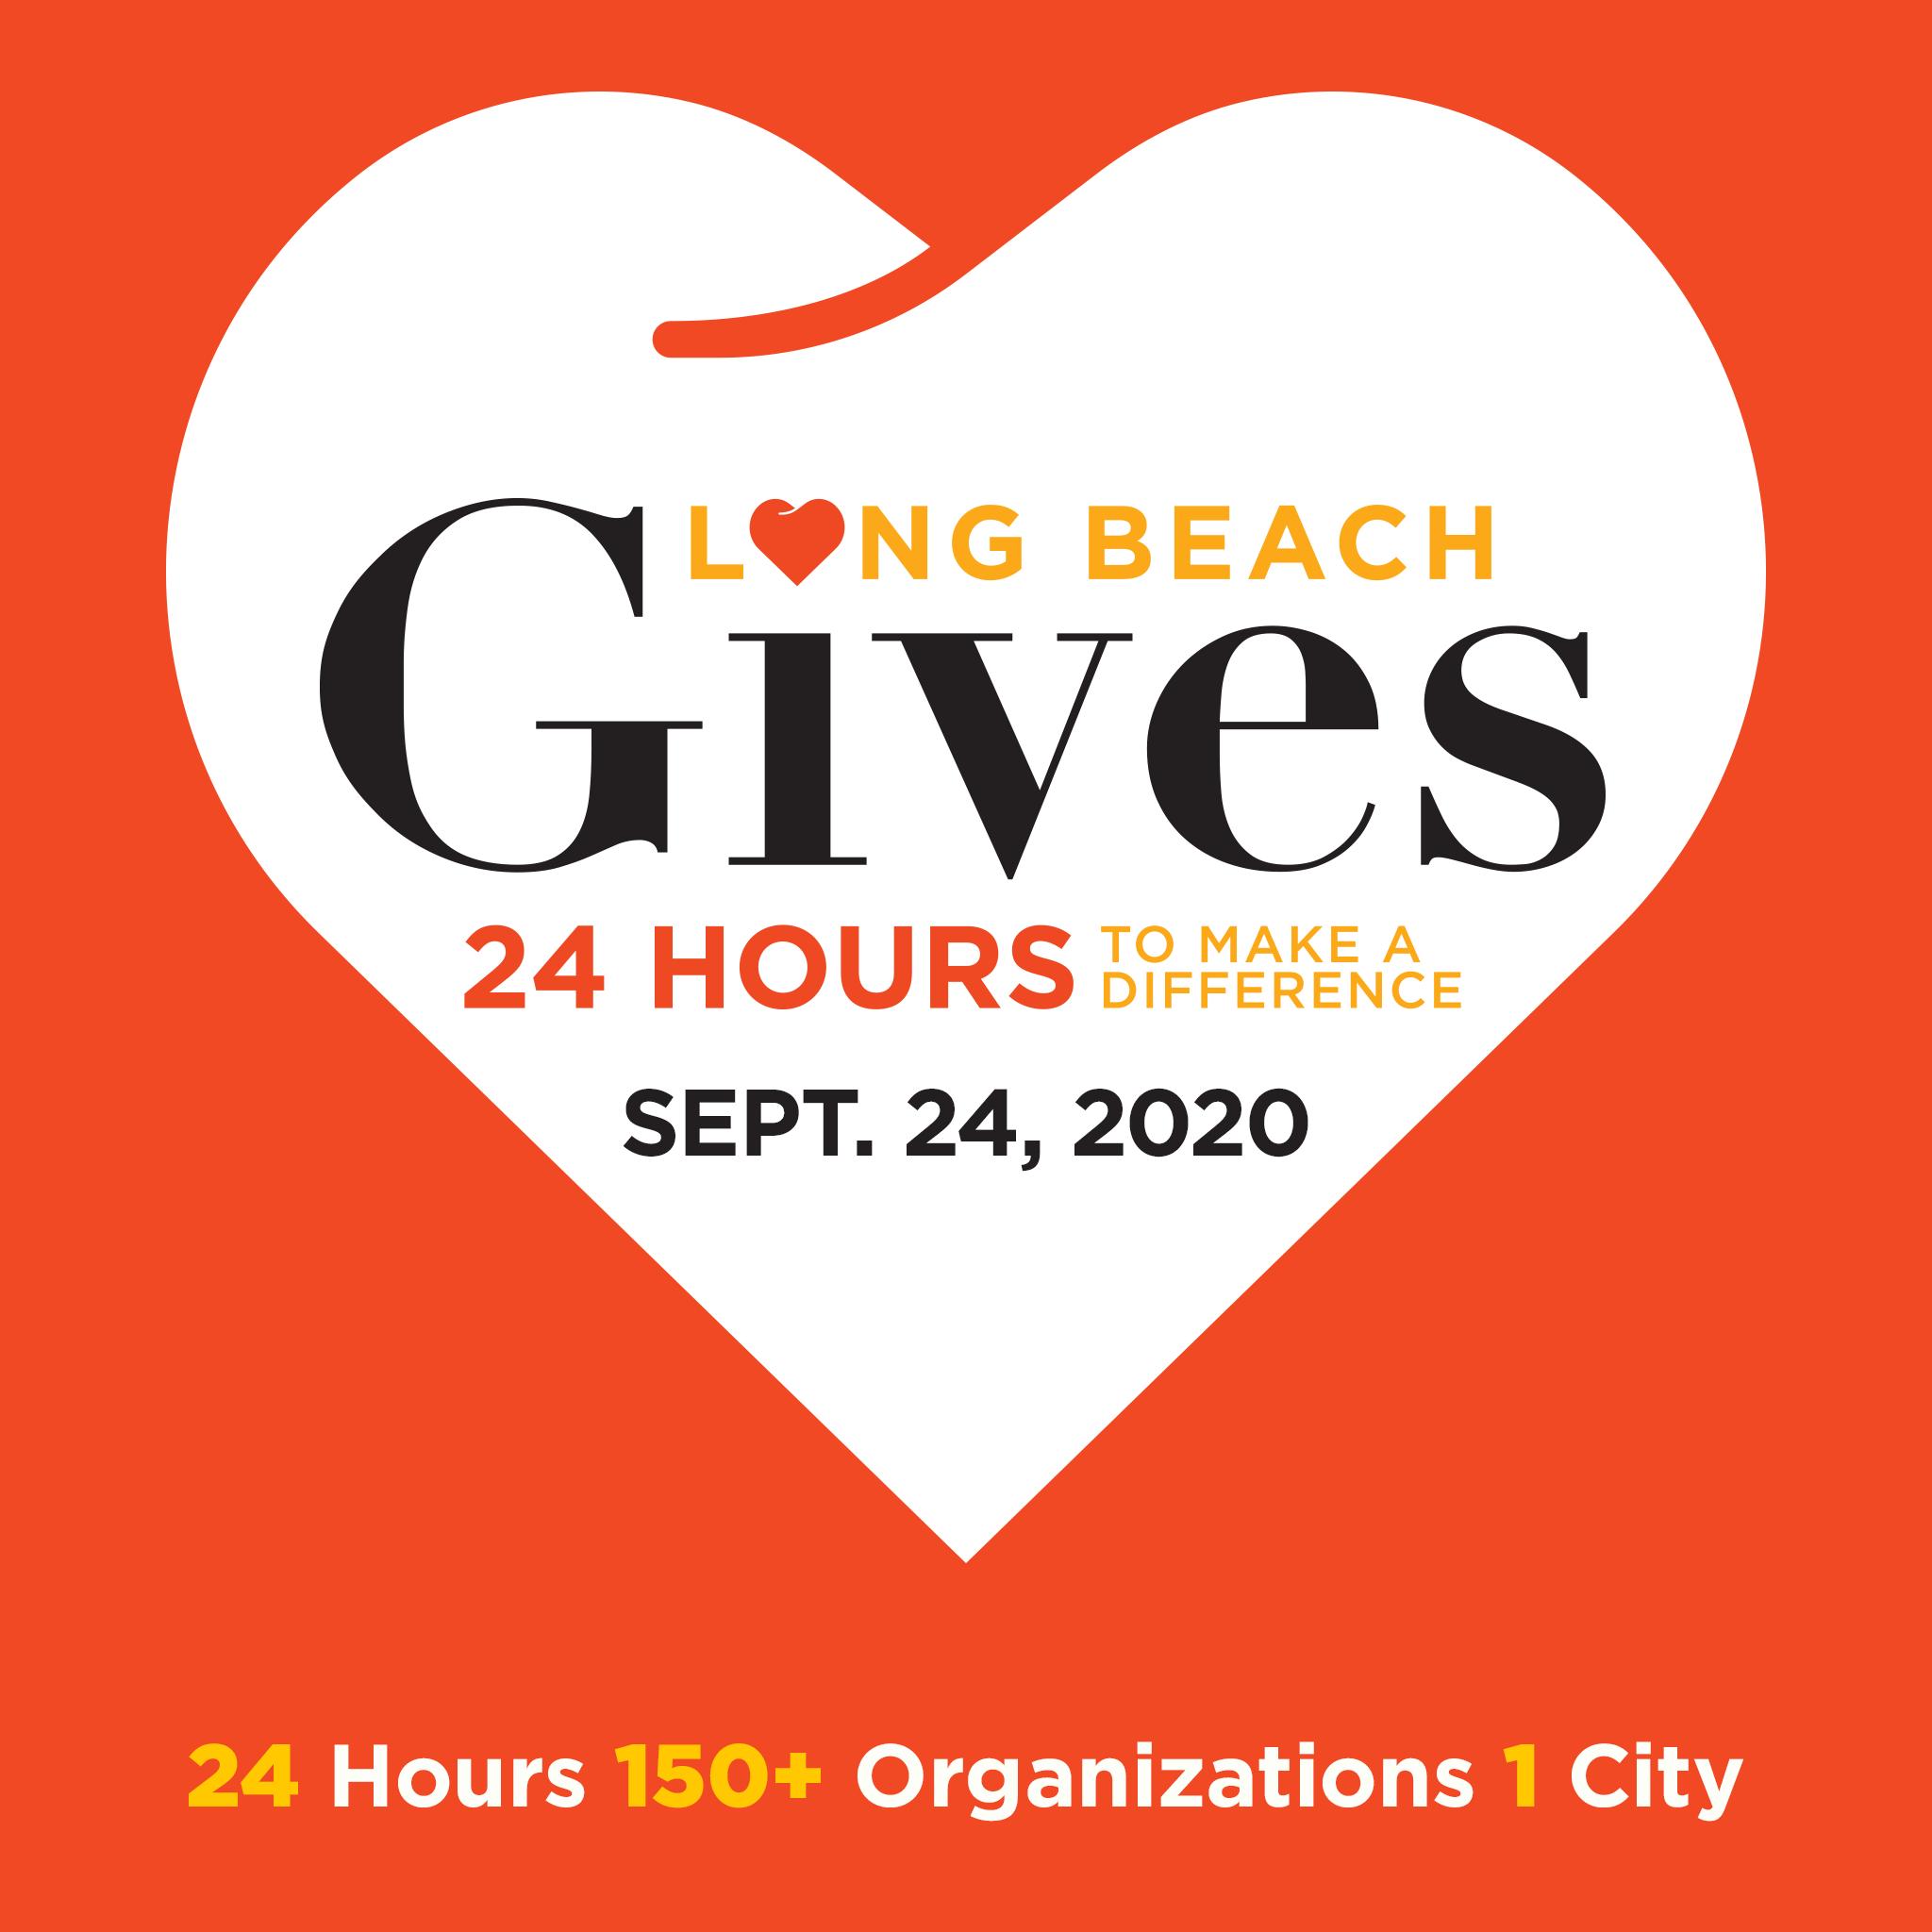 Long Beach Gives!